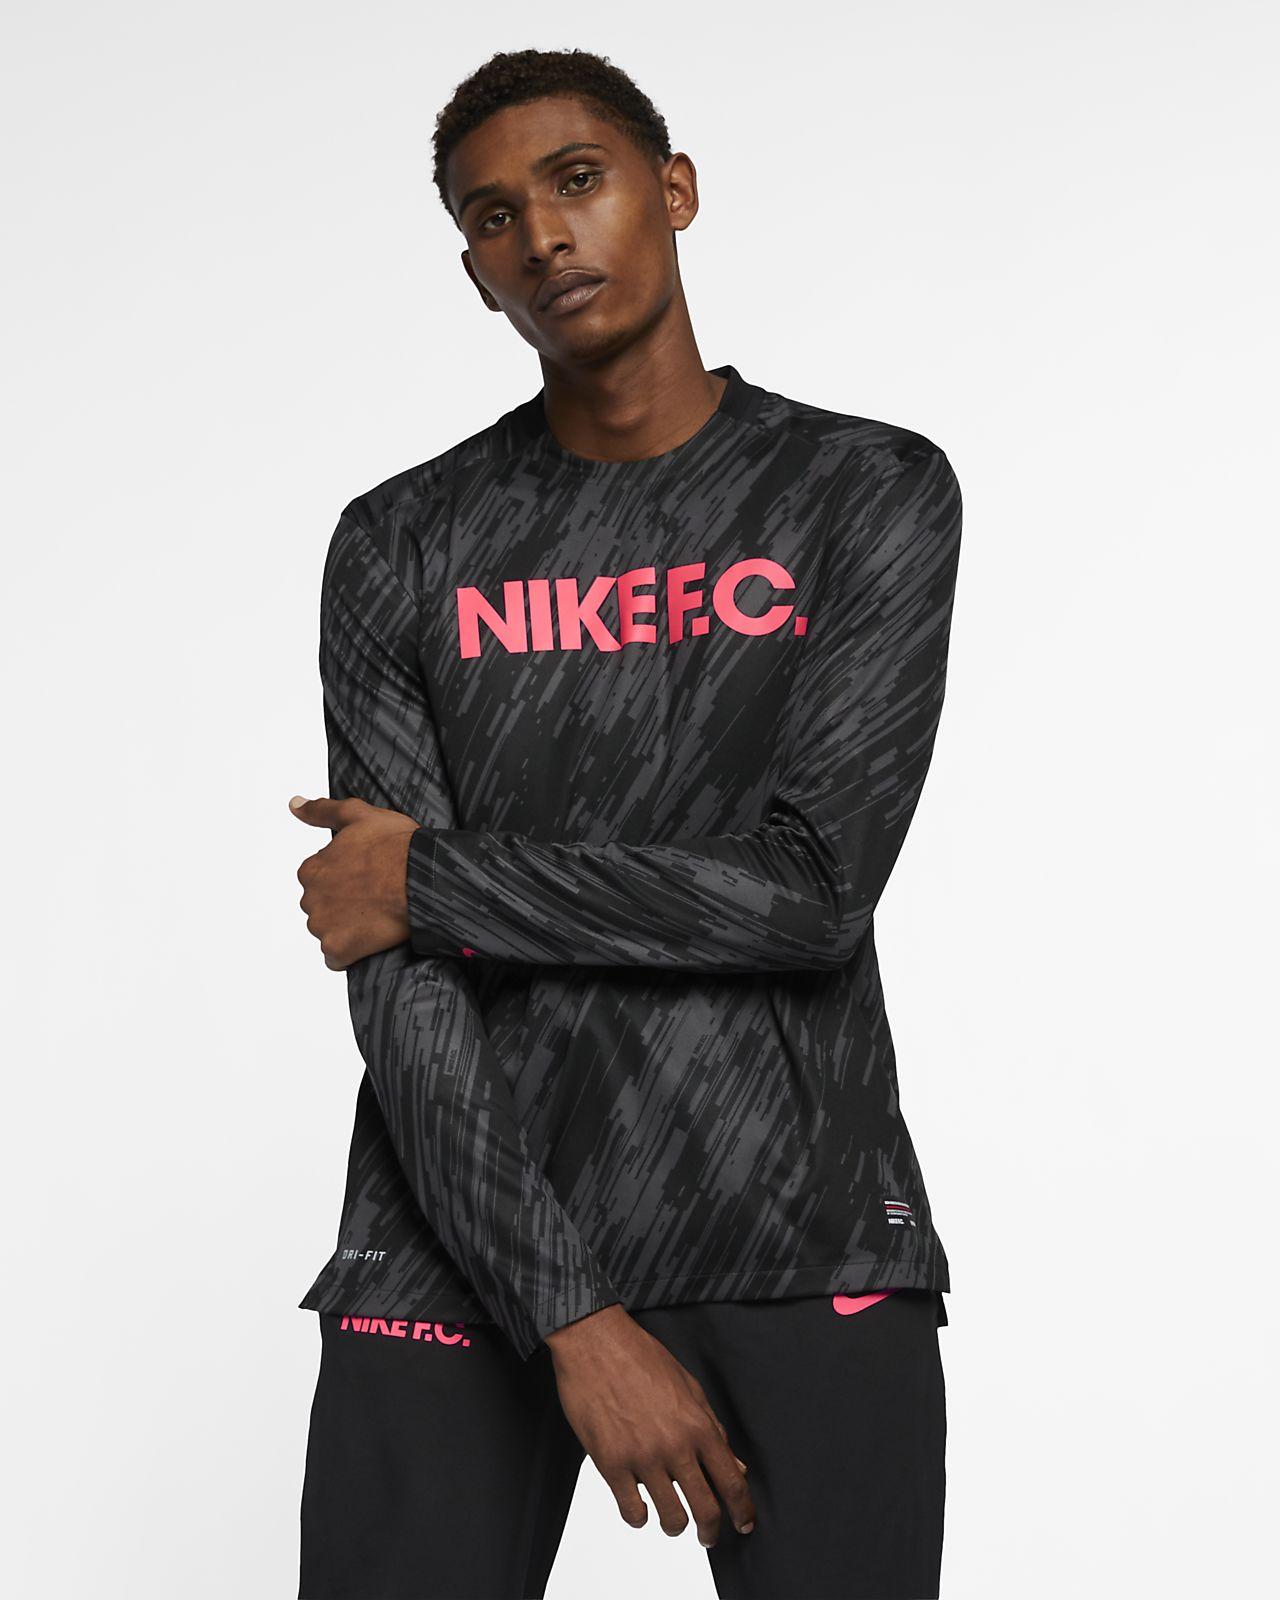 786d595093 Nike F.C. Long-Sleeve Football Shirt. Nike.com GB